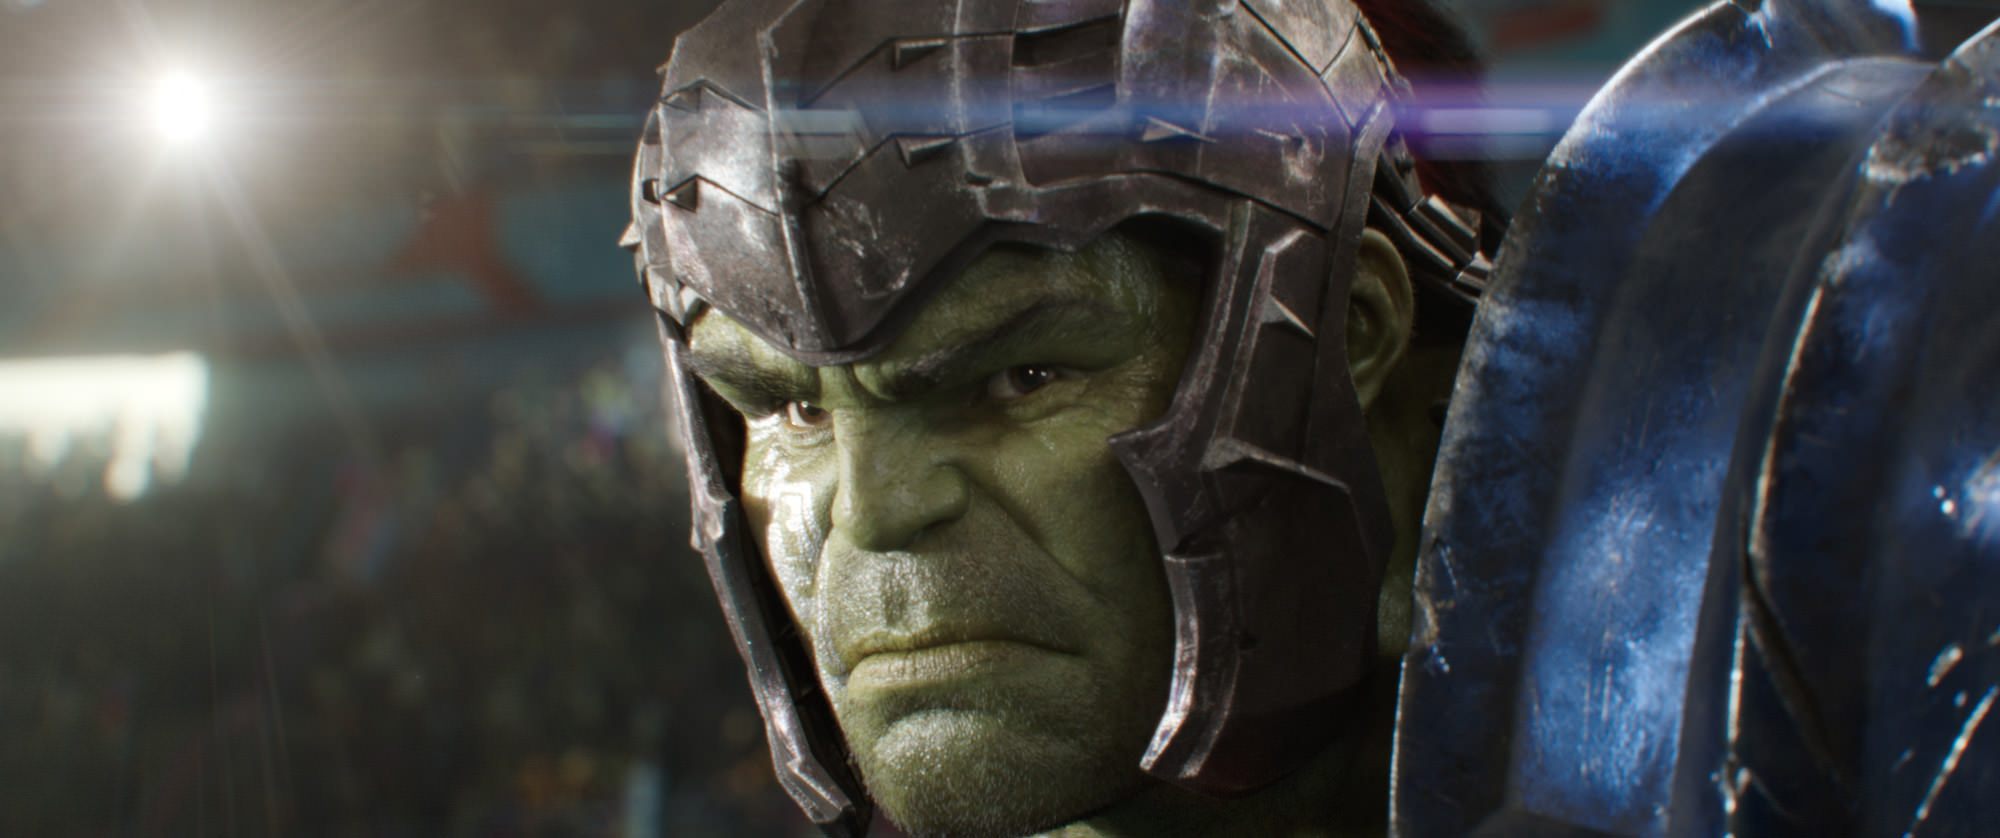 Fiche film : Thor - Ragnarok | Fiches Films | DigitalCiné